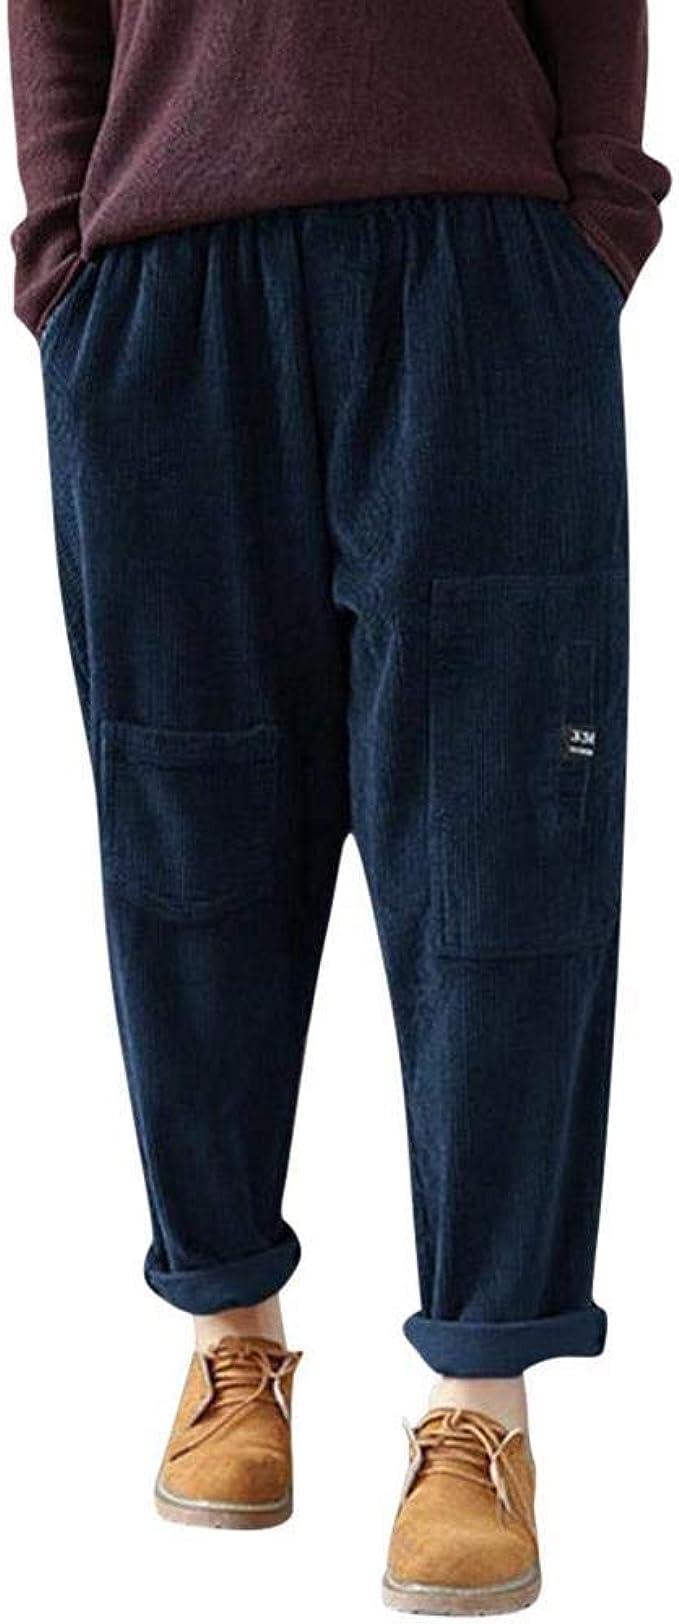 Tasty Life Pantalones Casuales De Mujer, Pantalones De Pana ...